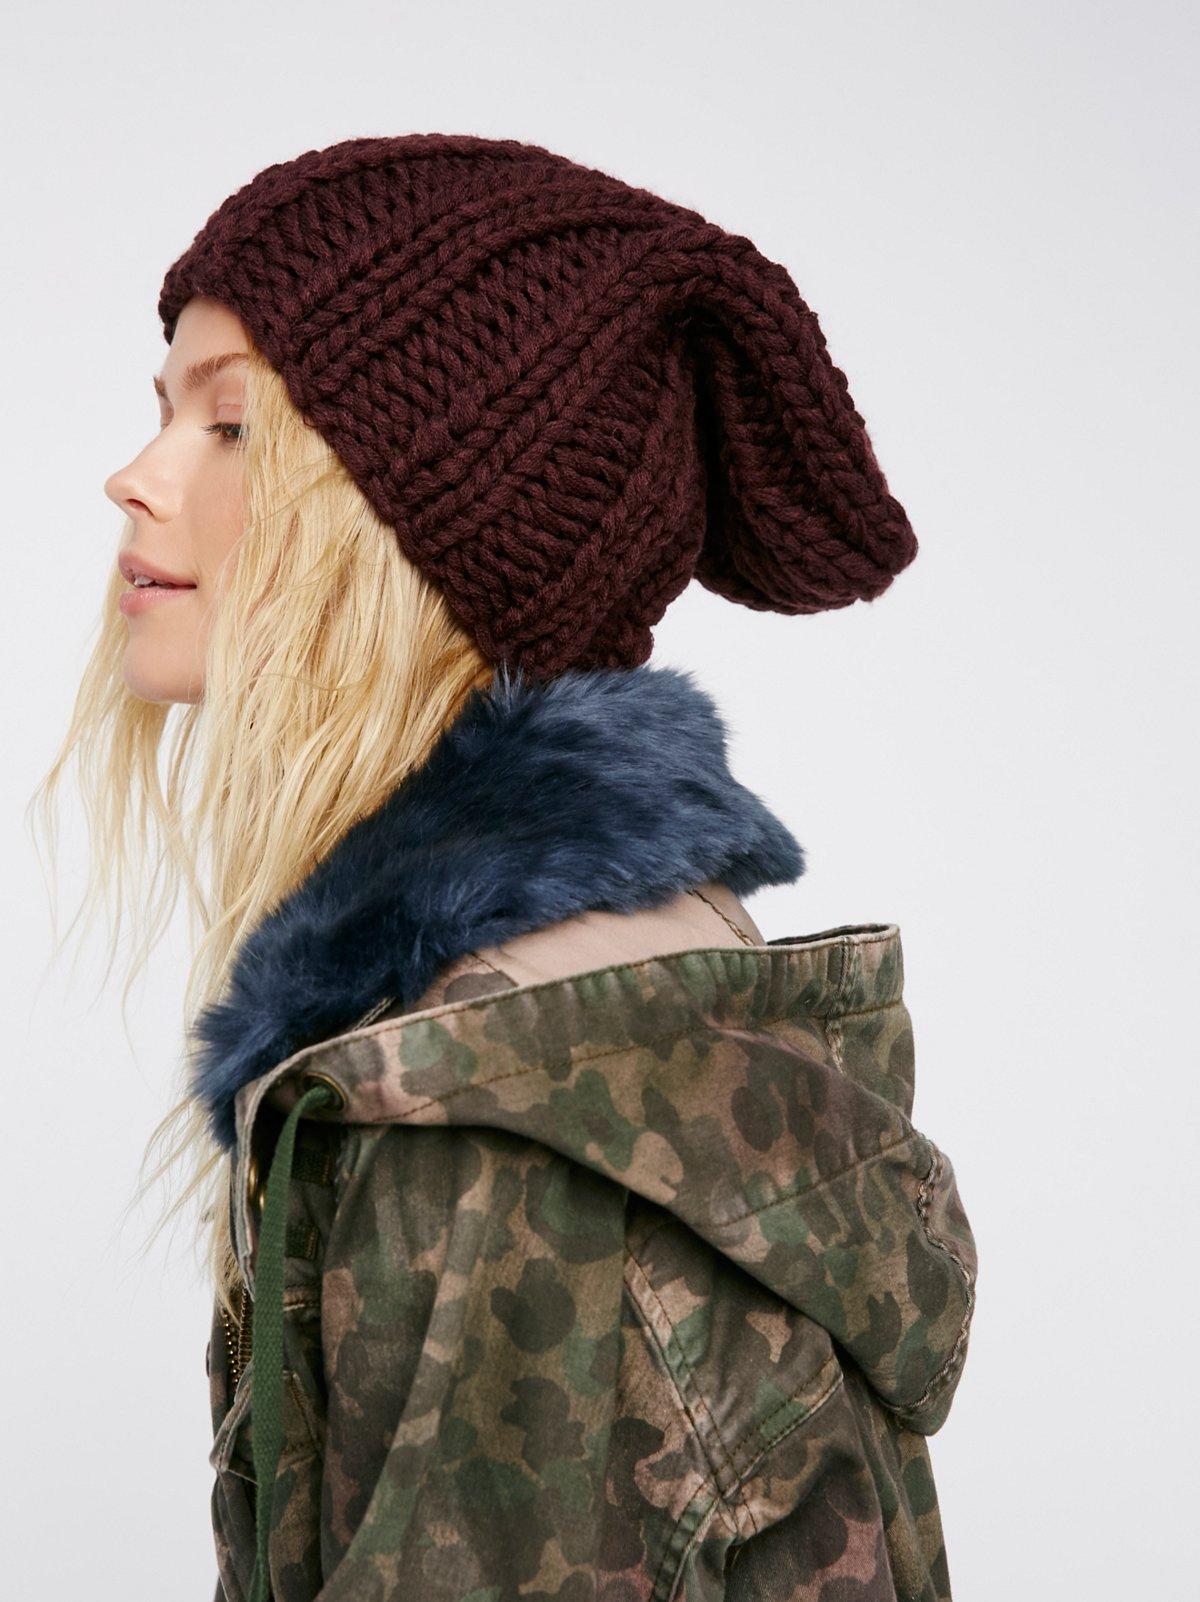 Back to Basics粗线针织帽